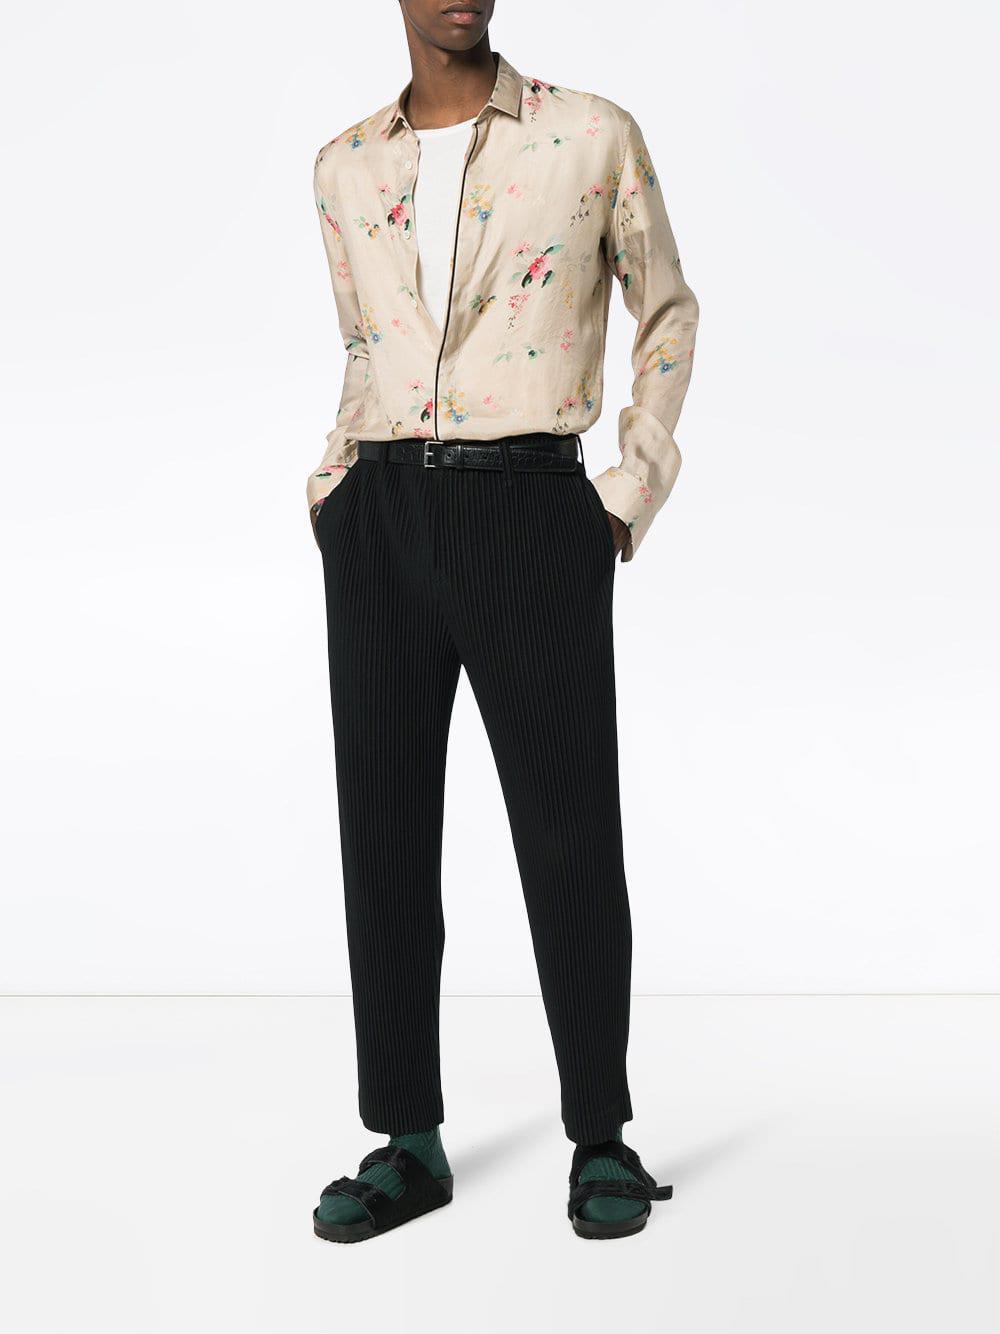 Haider Ackermann Floral Print Satin Long Sleeve Shirt in Beige (Natural) for Men